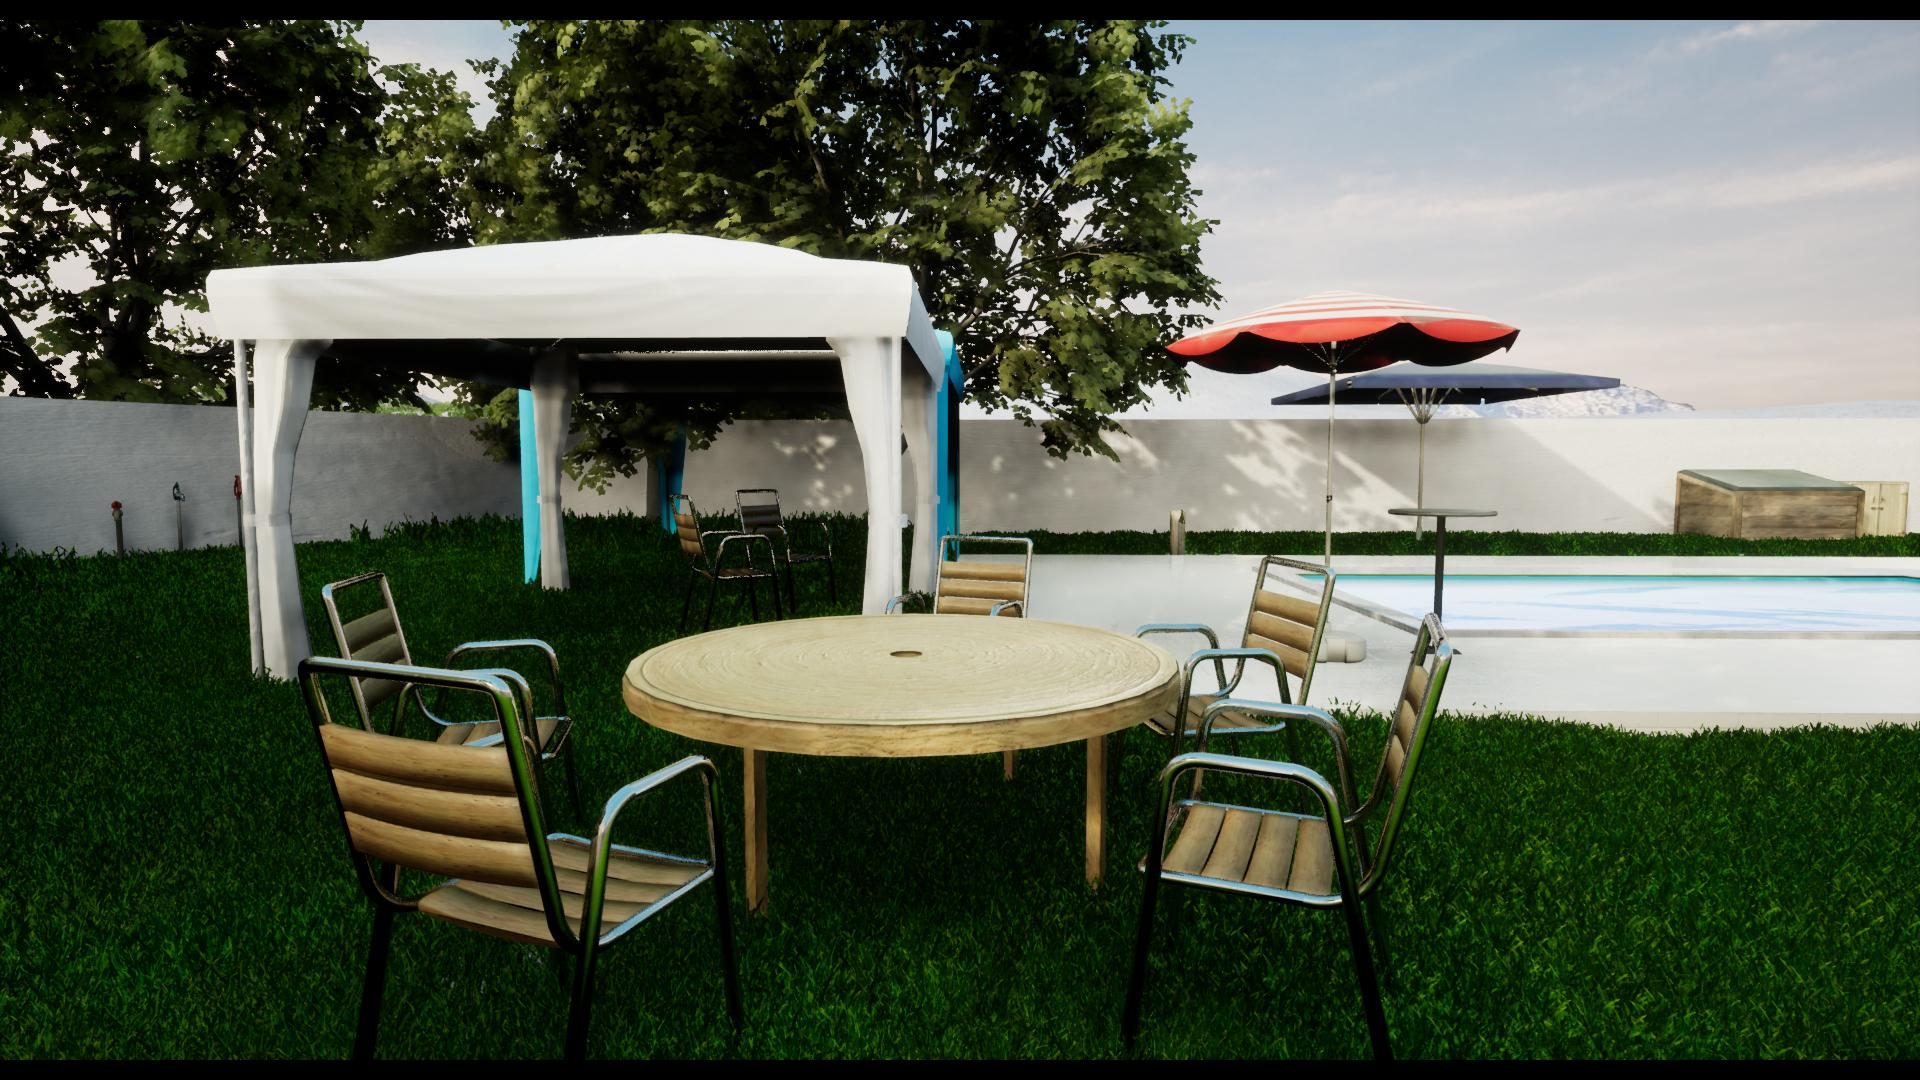 Tremendous Outdoor Pack Furniture Gazebo Tents Swimming Pool Interior Design Ideas Inesswwsoteloinfo